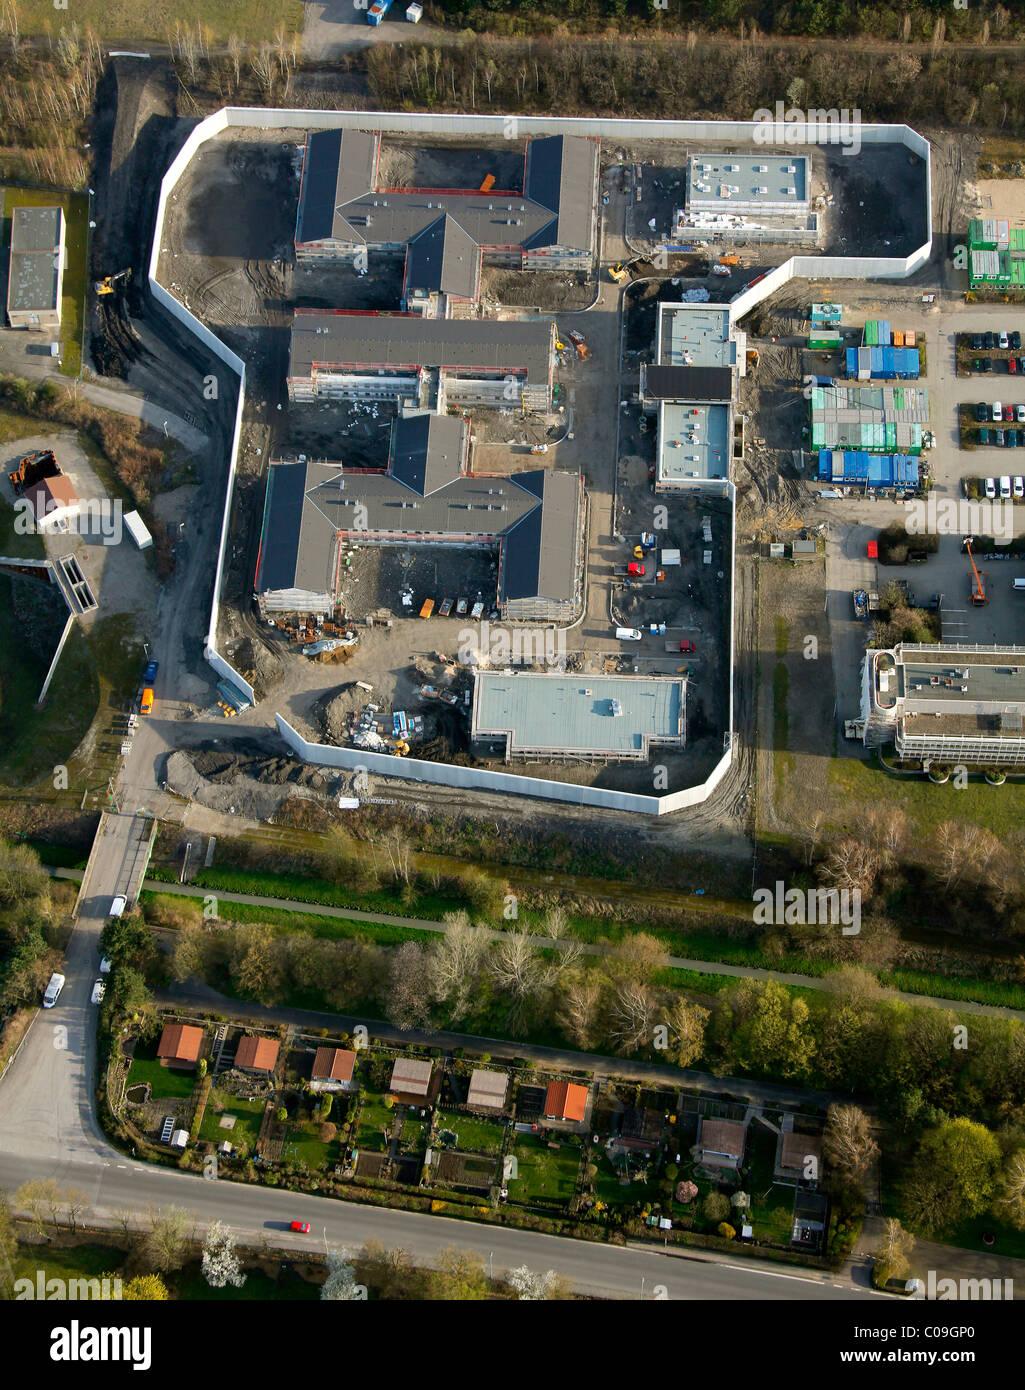 Aerial view, forensics, preventive detention, Wanne-Eickel, Herne, Ruhrgebiet region, North Rhine-Westphalia, Germany, - Stock Image